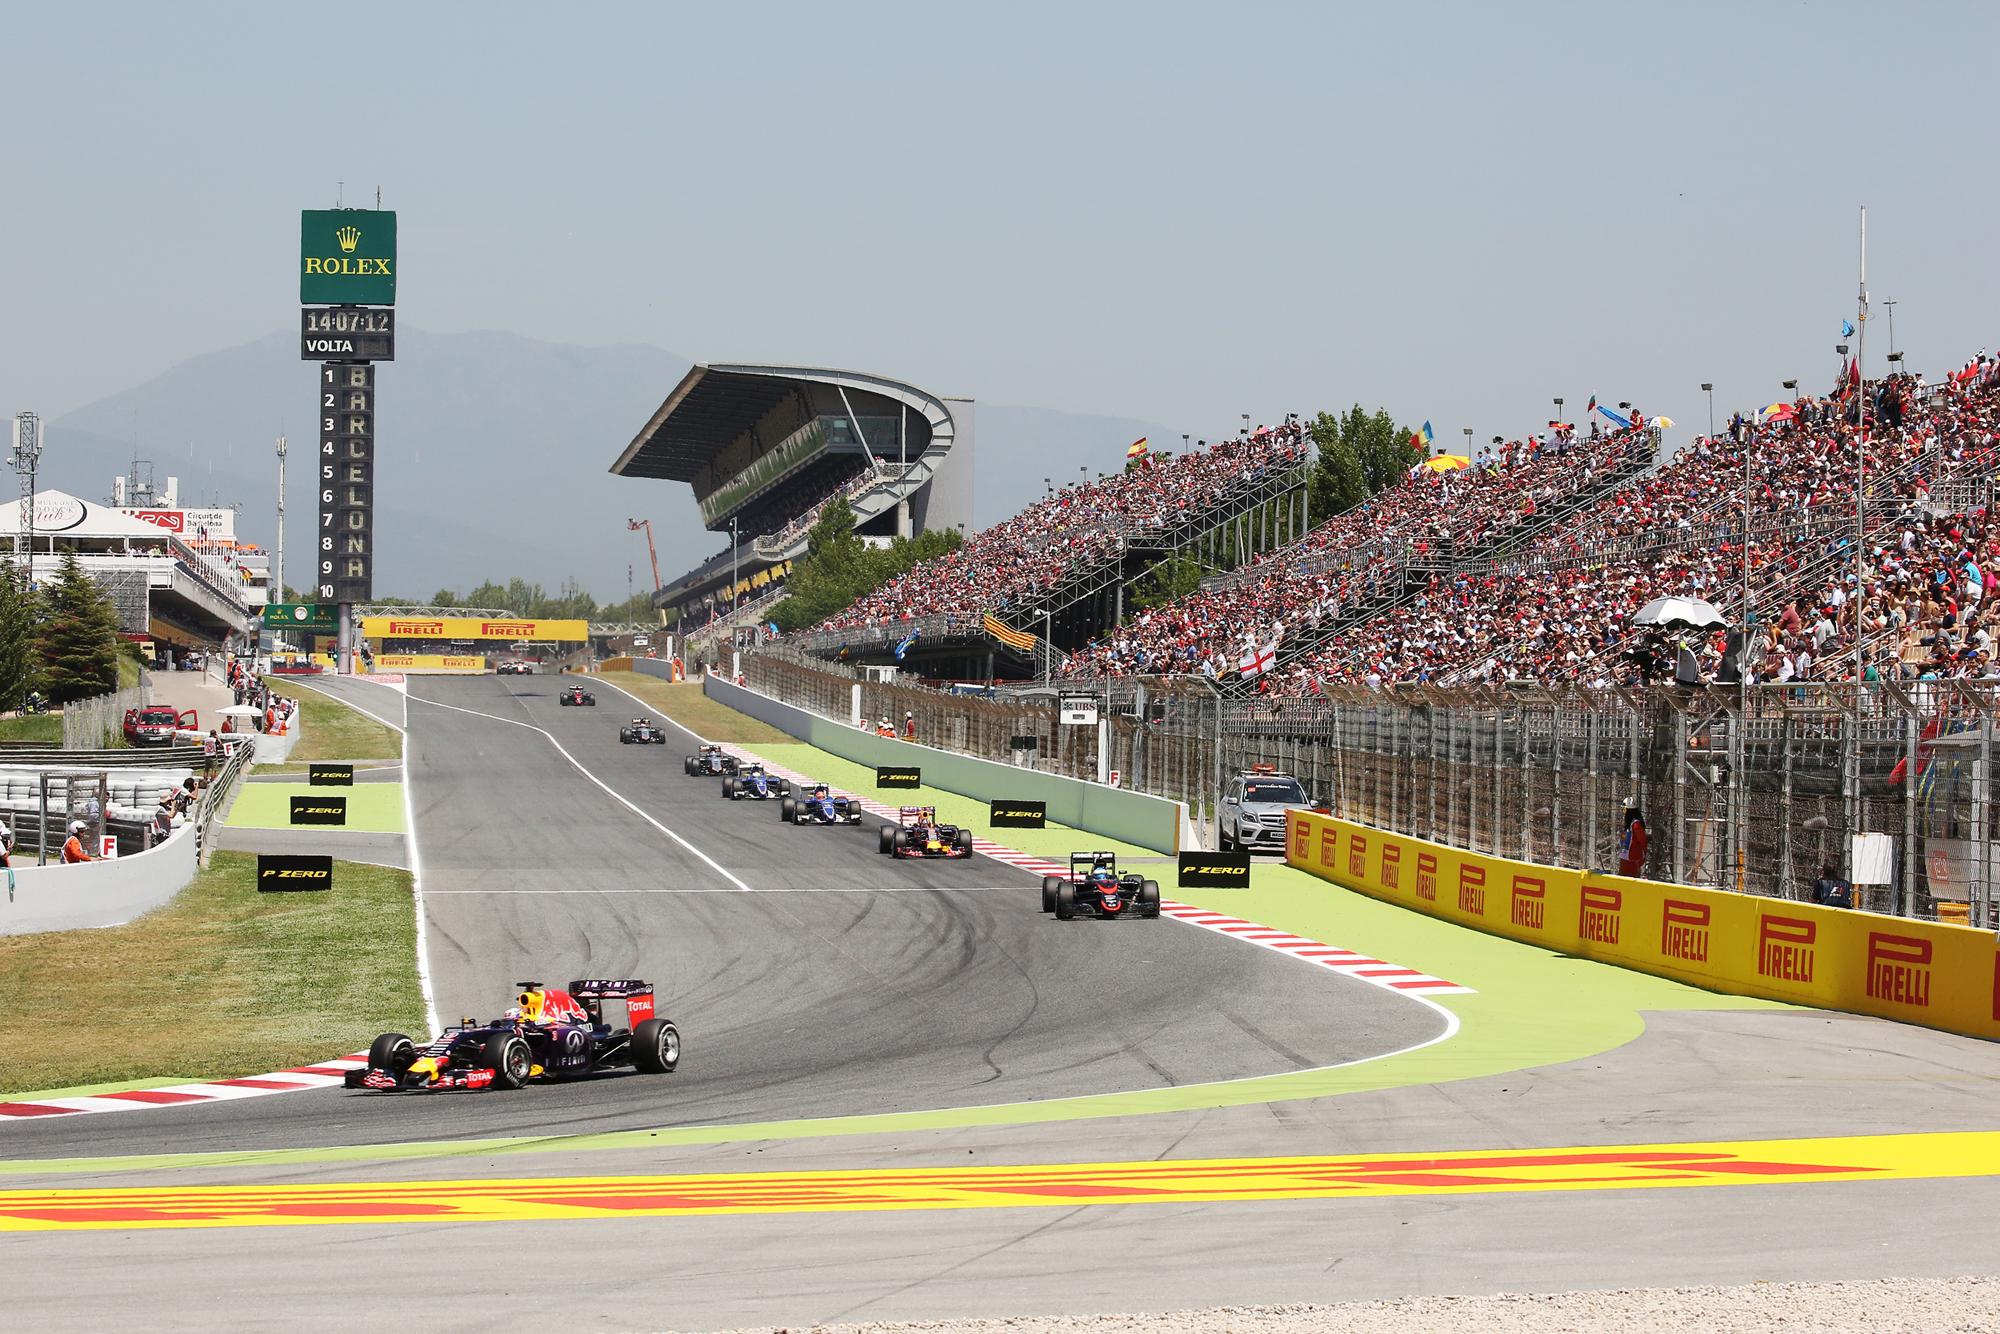 F1 Gran Premi d'Espanya 2016